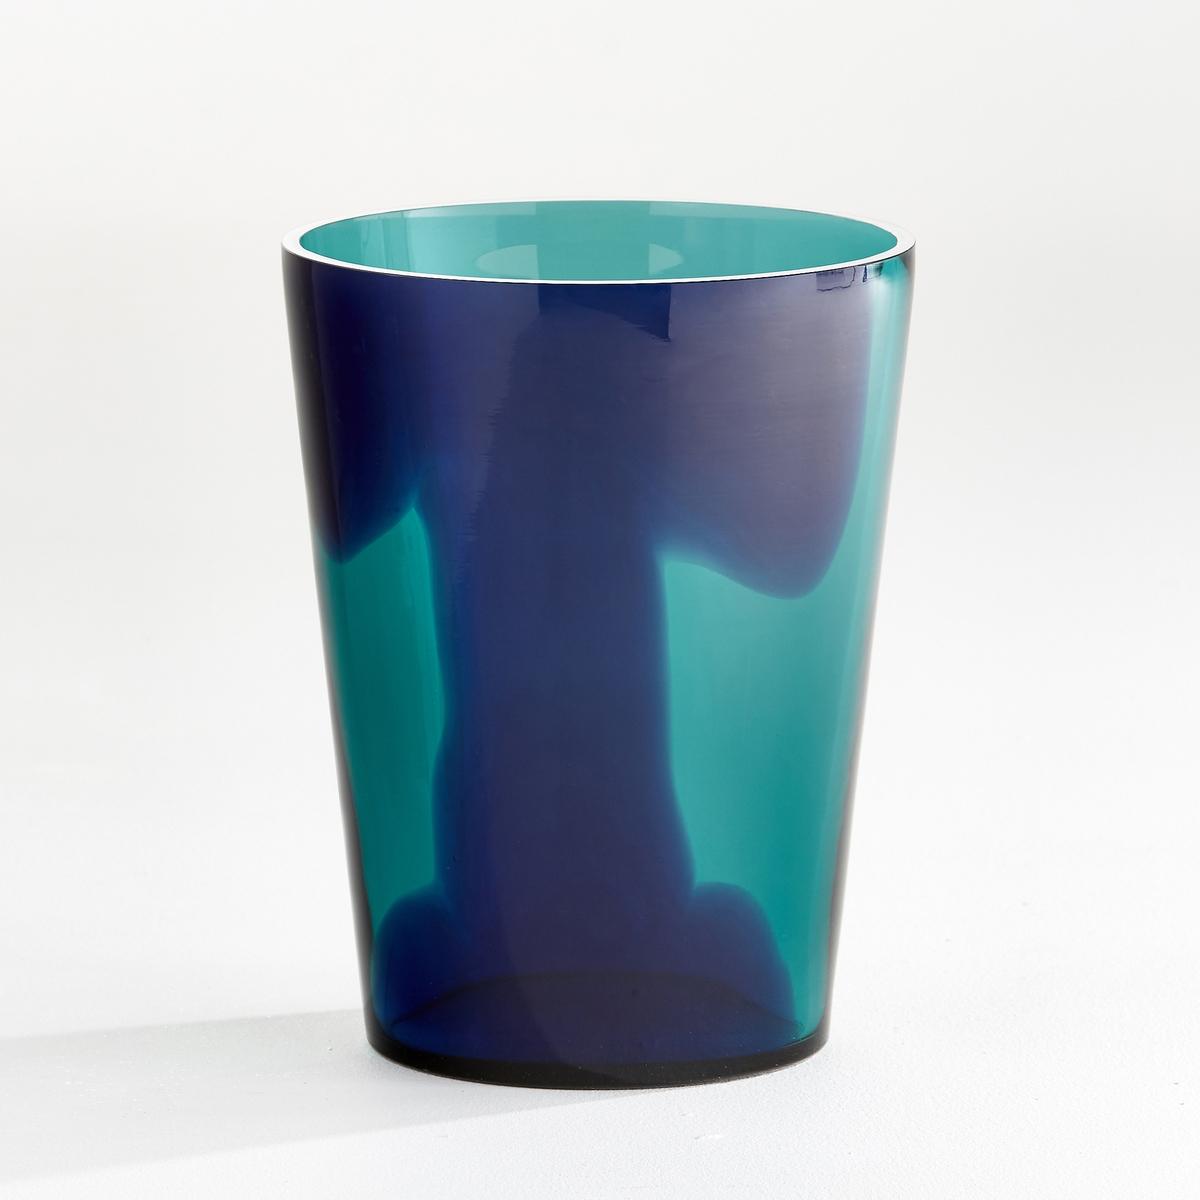 Ваза, Odomar<br><br>Цвет: зеленый/ синий,янтарь